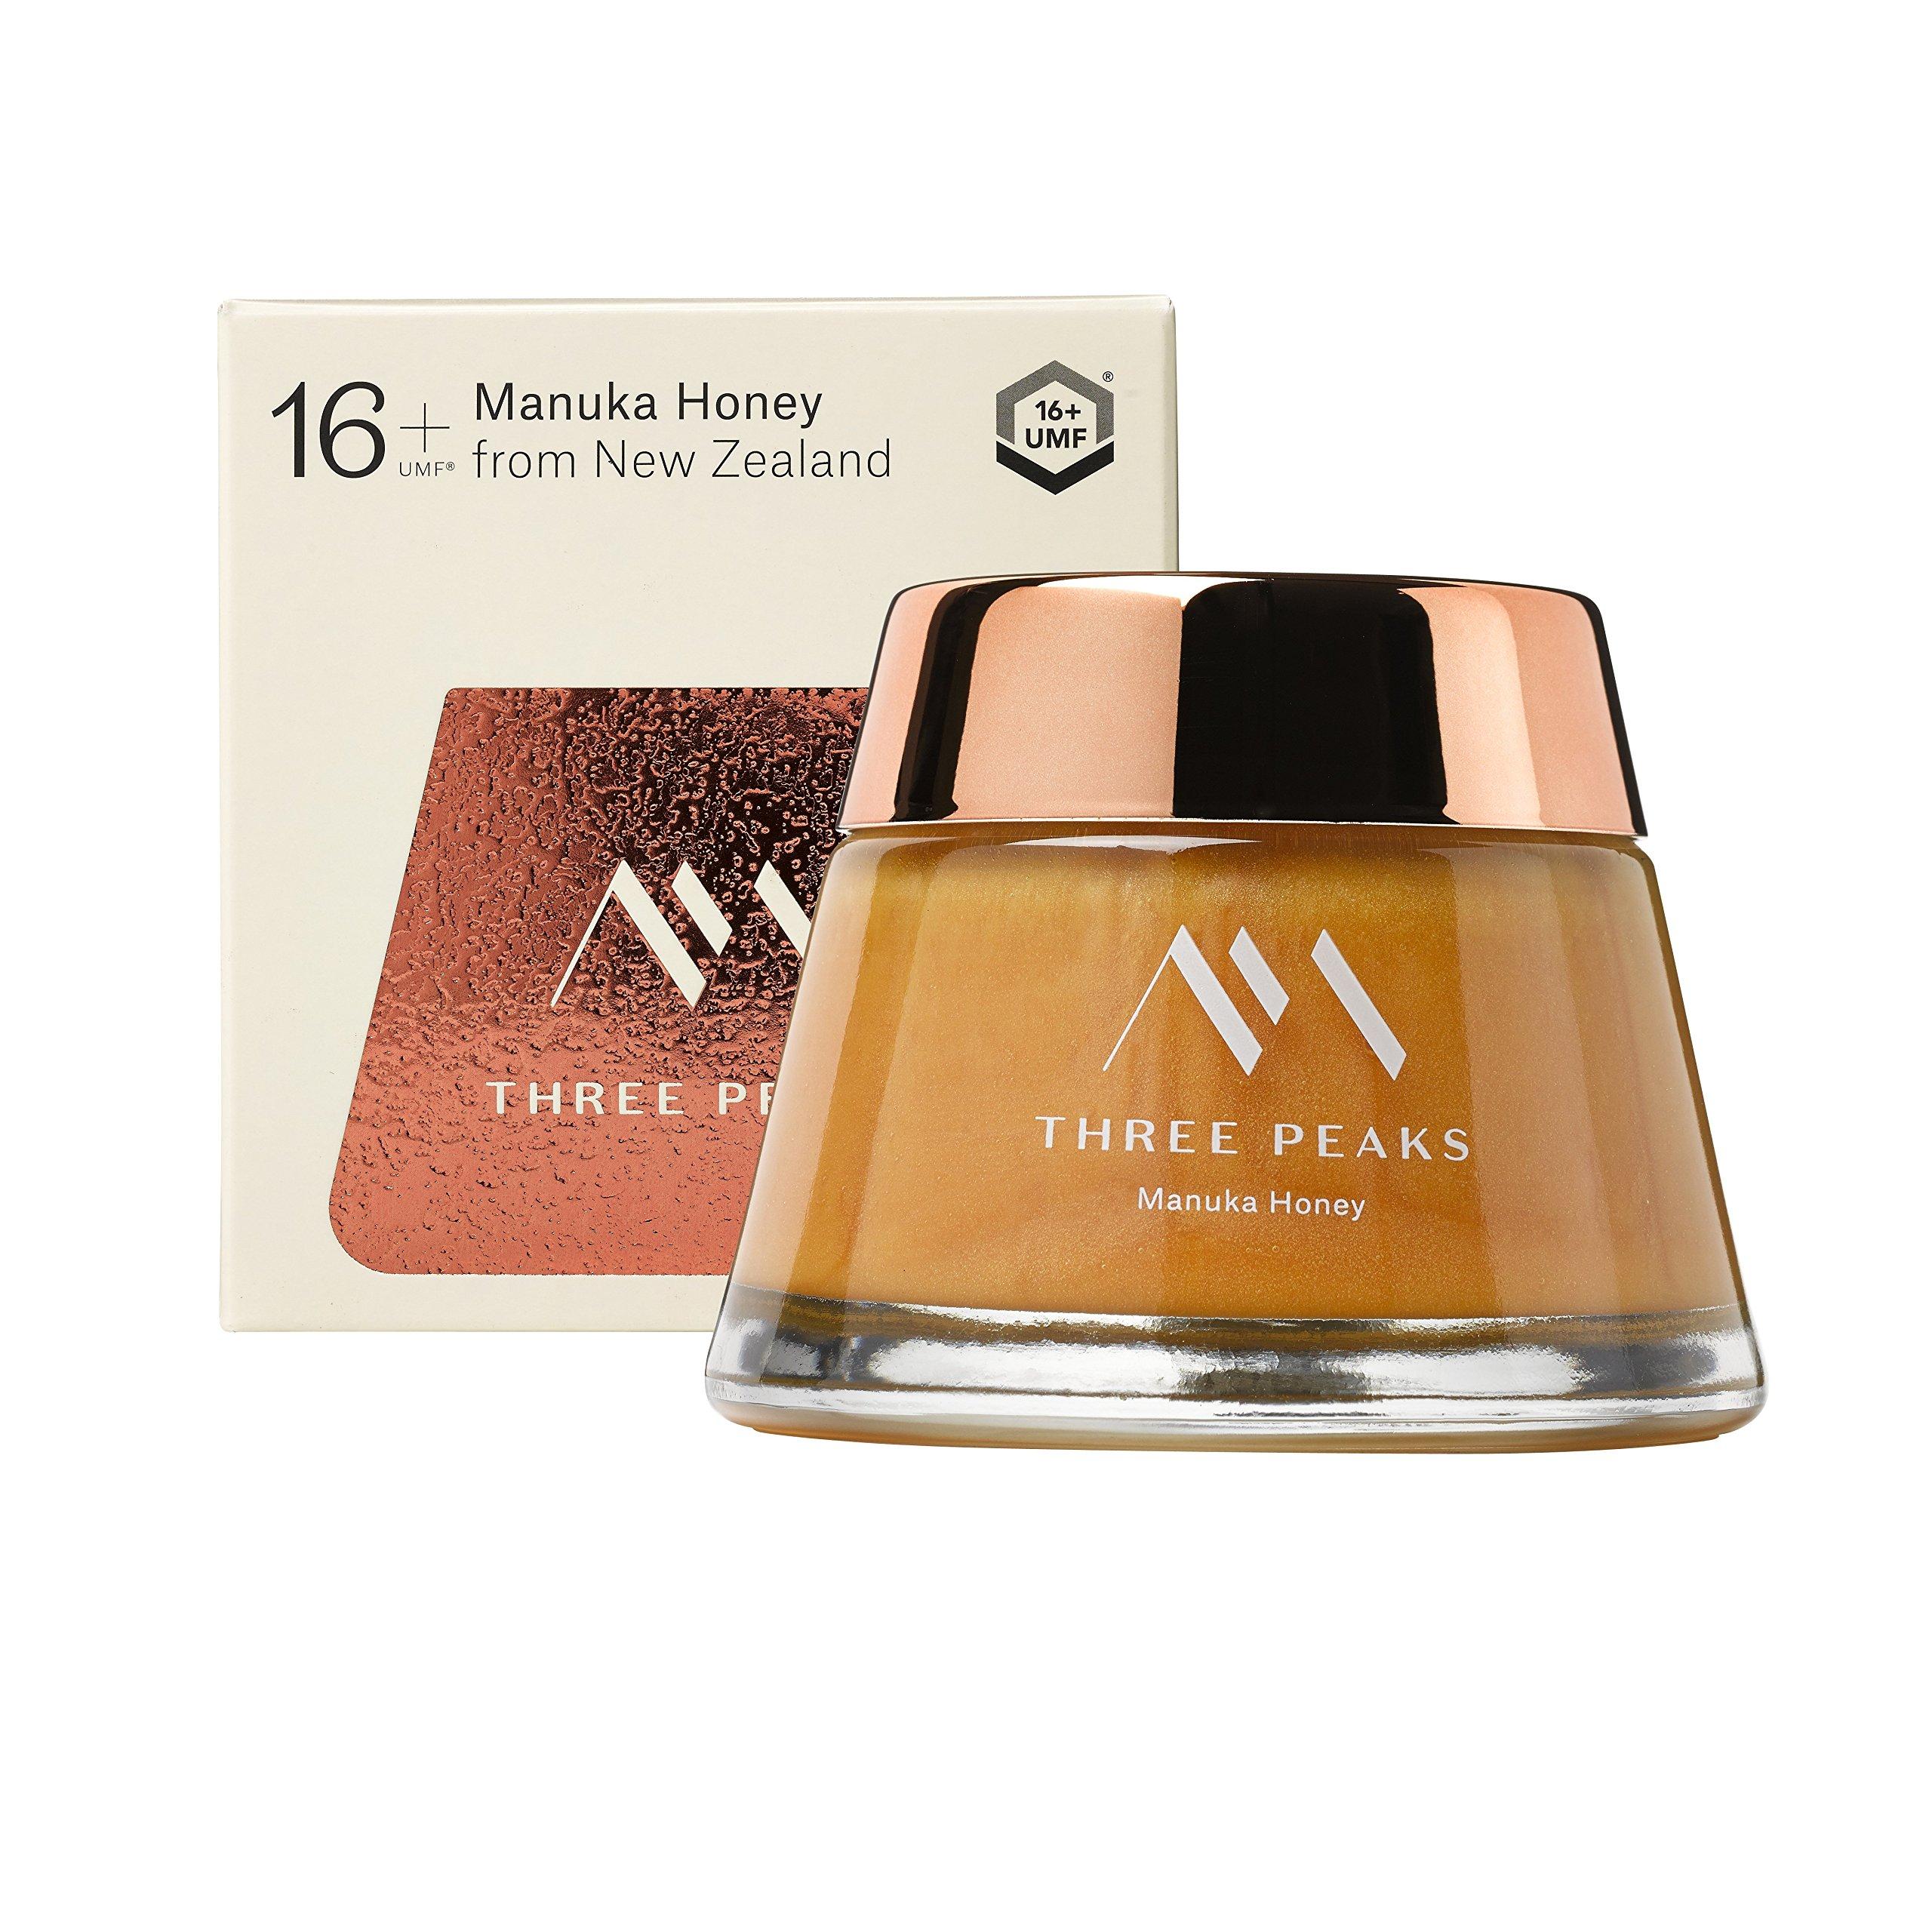 Three Peaks Manuka Honey New Zealand - Certified UMF 16+ - 7.05 oz (200gm) - 100% Natural honey, Raw honey – Ultra Premium, Healing Manuka honey